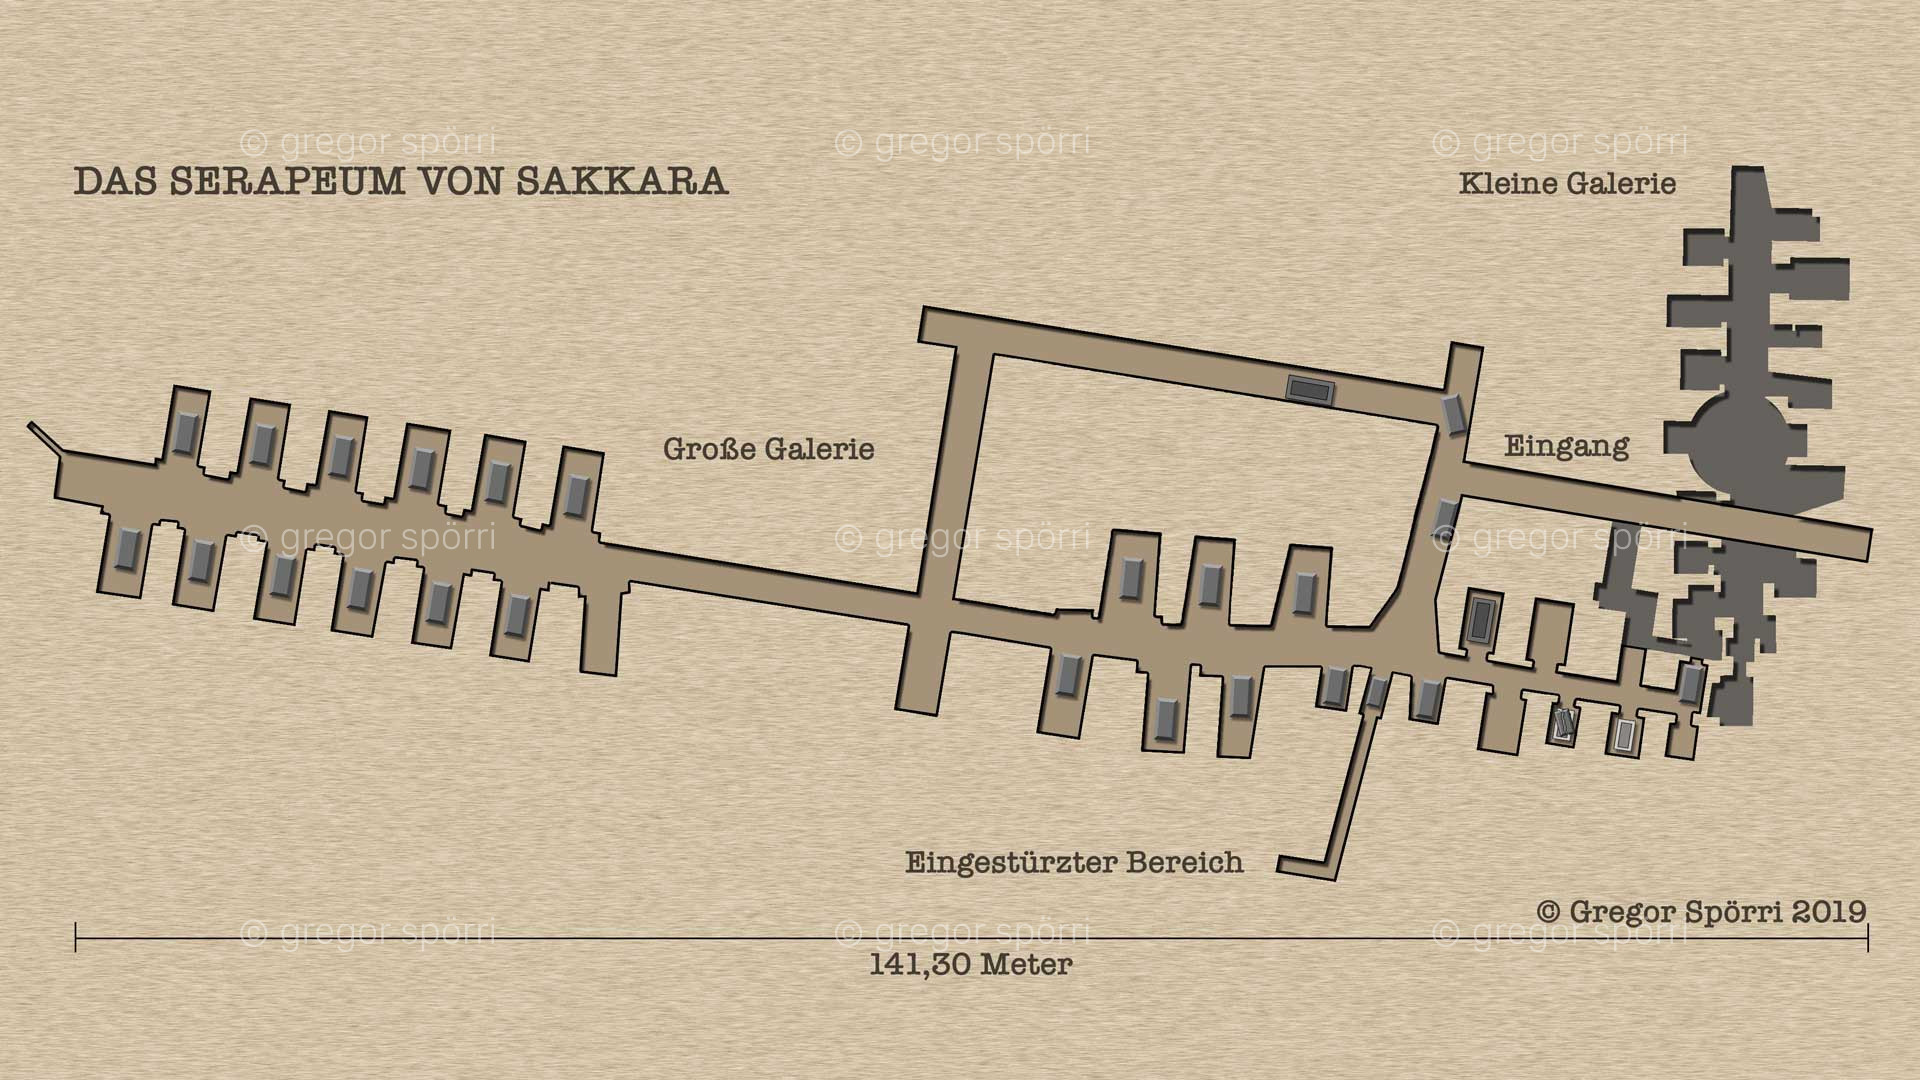 Current floor plan of the Serapeum (2019)